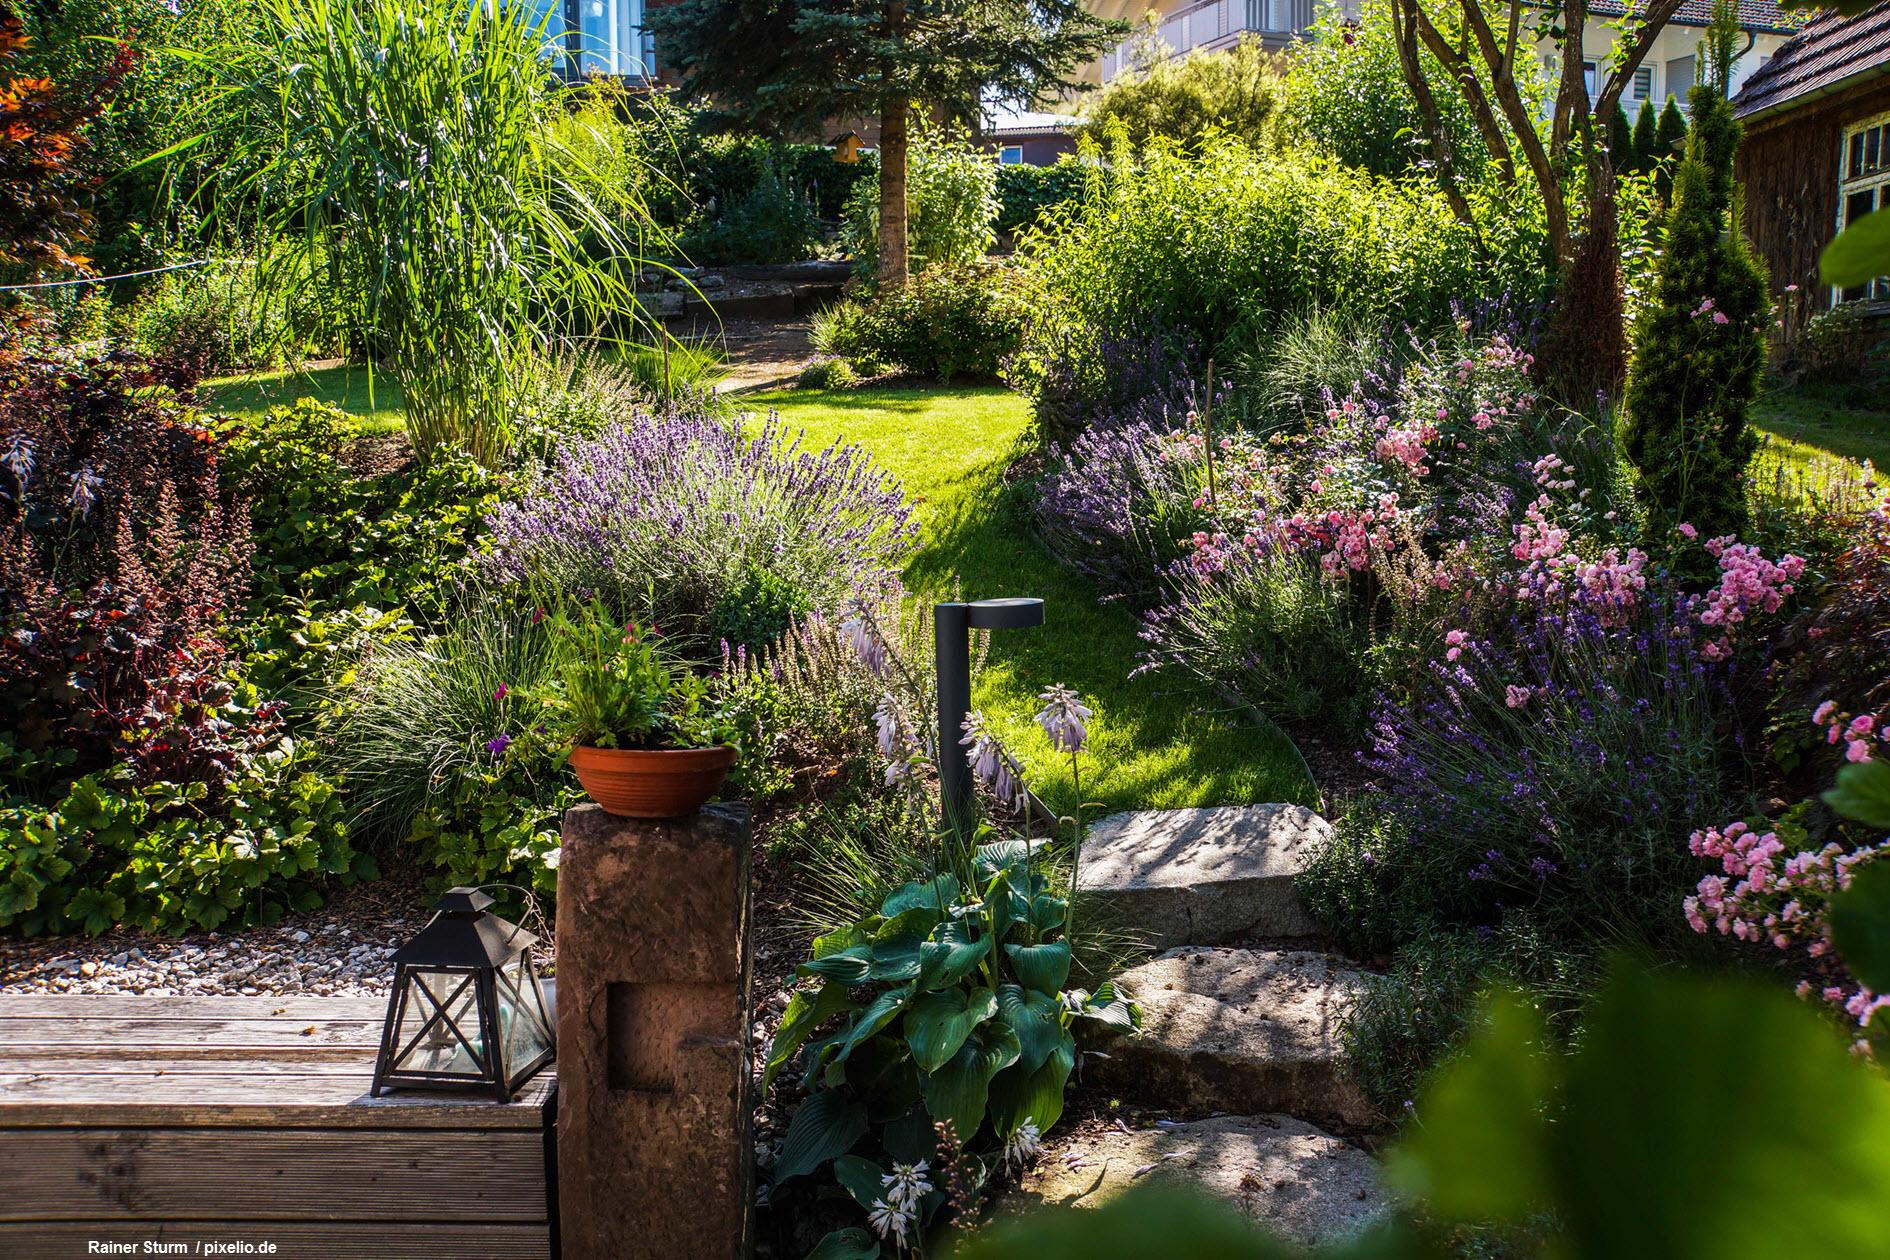 zeller garten landschaftsbau ihr zuverl ssiger partner im landschaftsbau. Black Bedroom Furniture Sets. Home Design Ideas